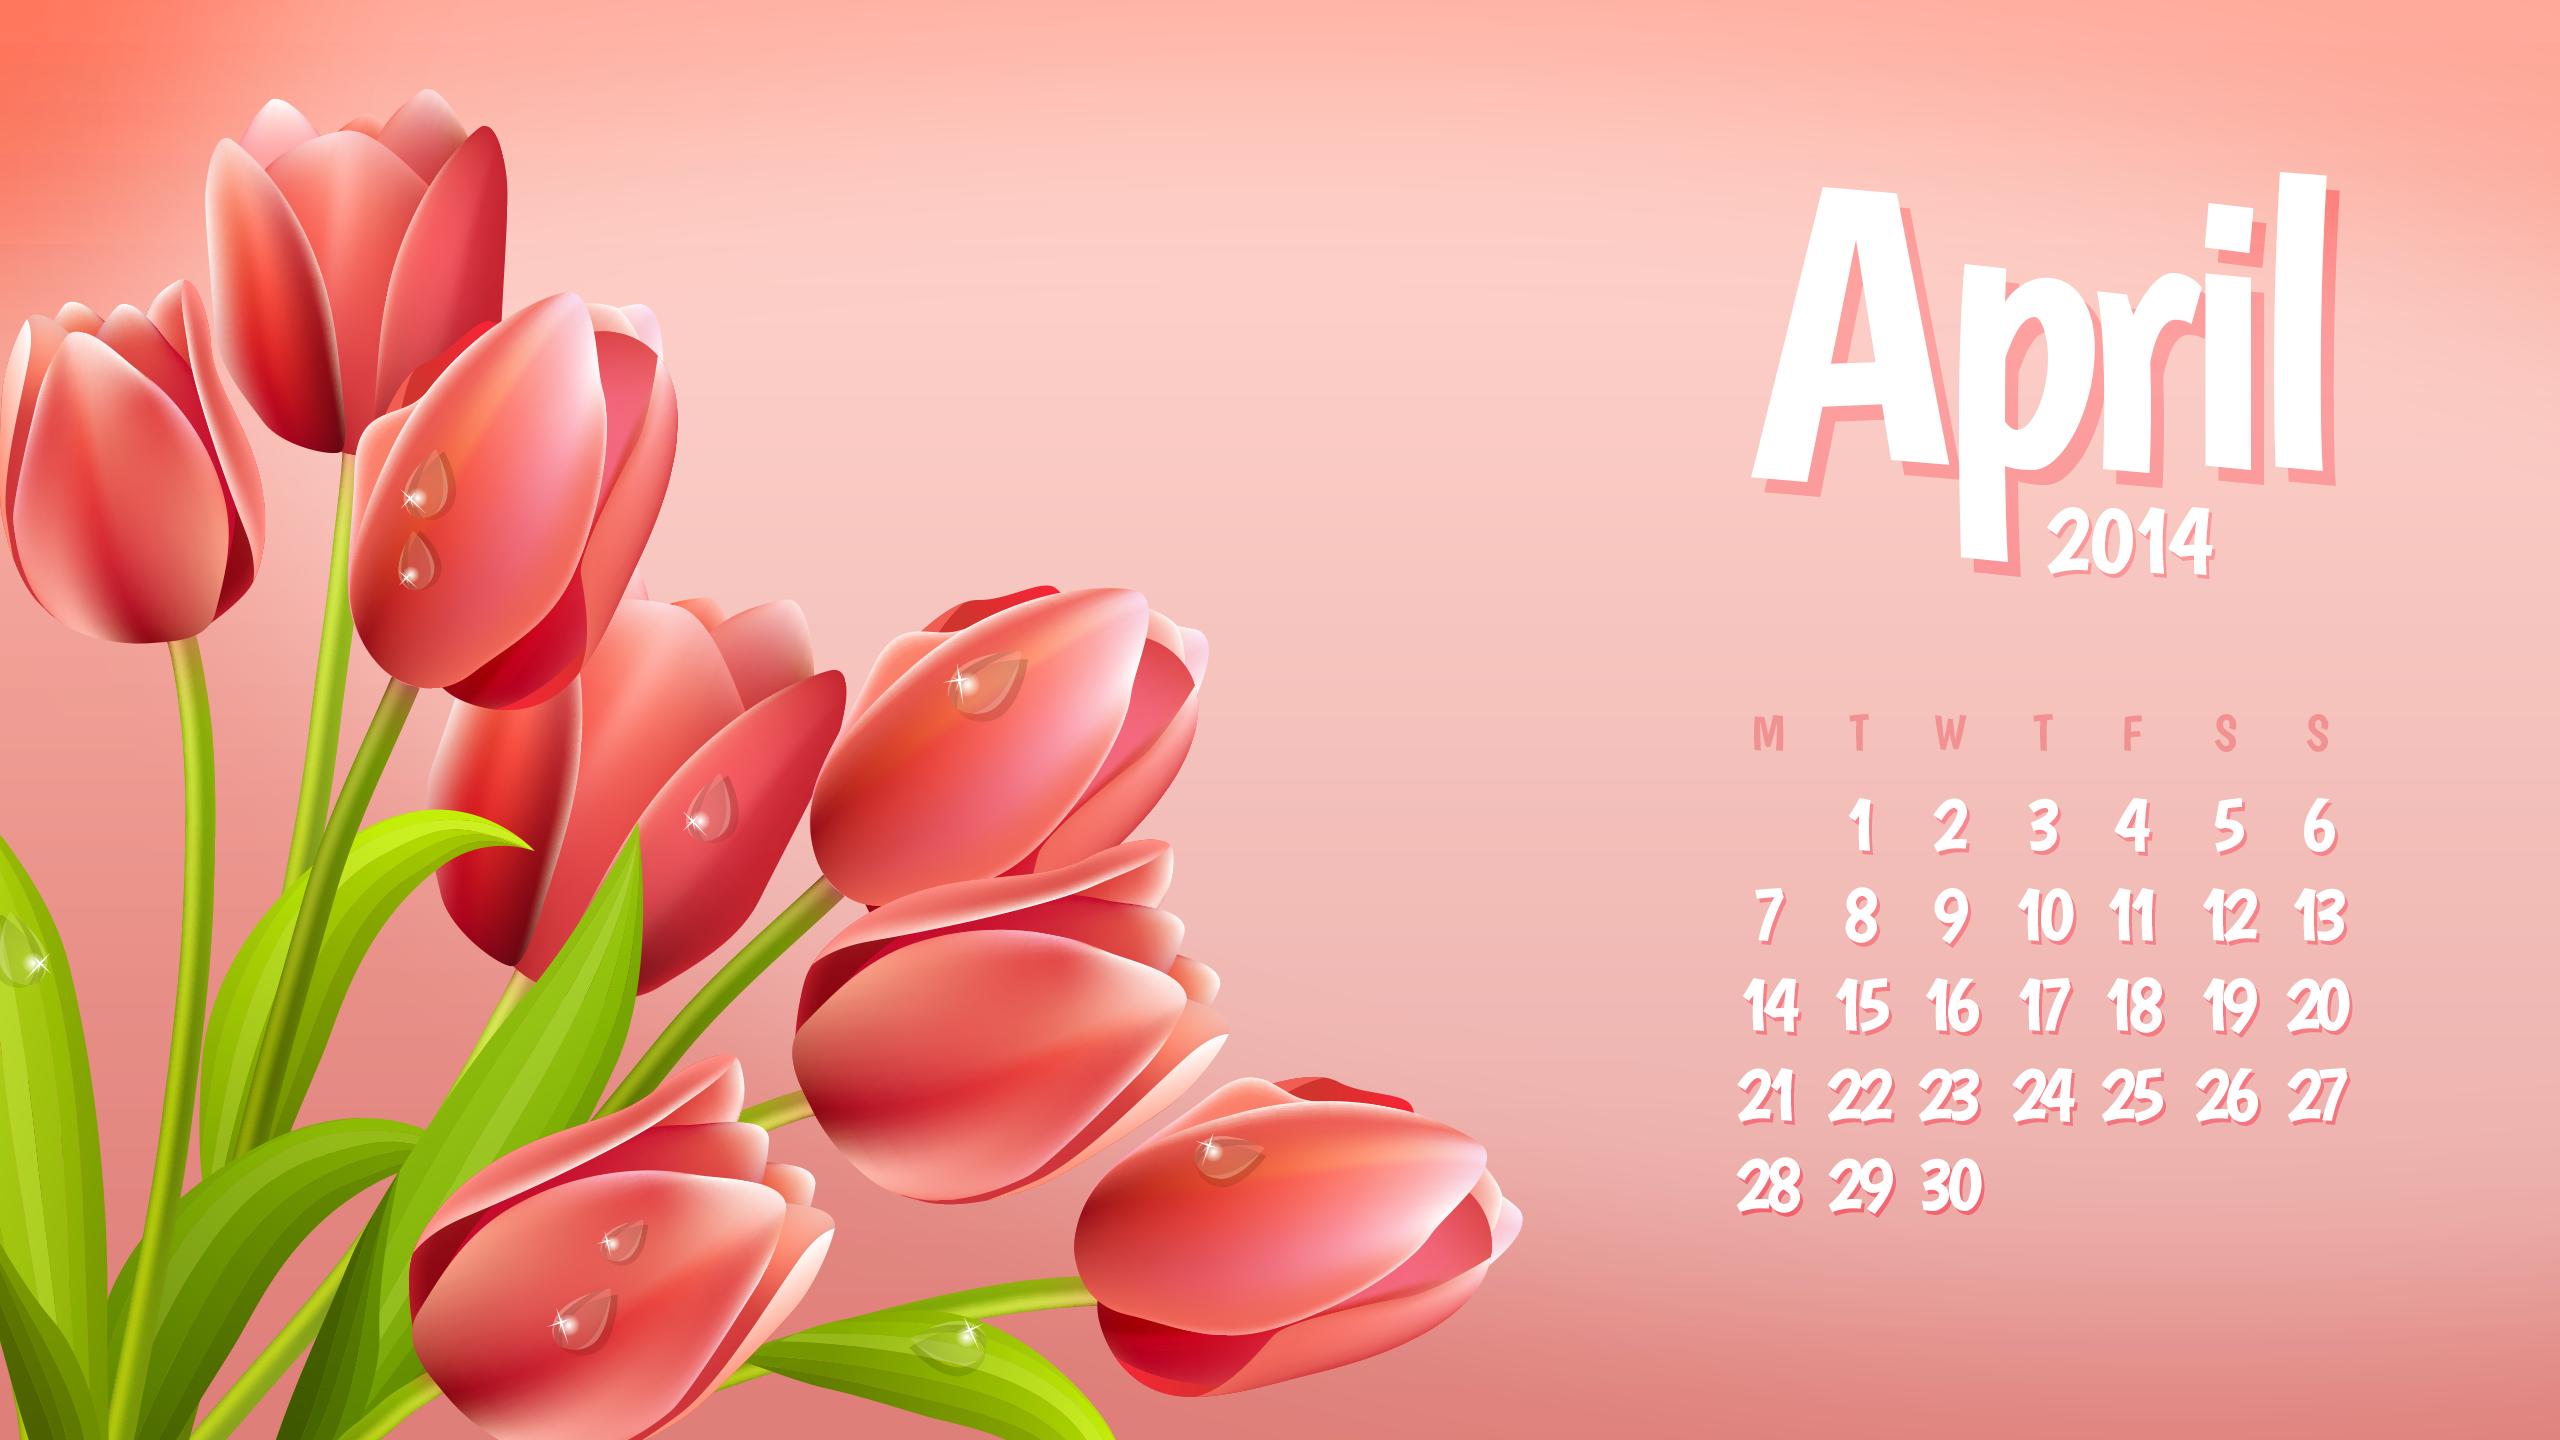 Wallpaper Calendar April 2014   Szabokacom   Szabokacom 2560x1440